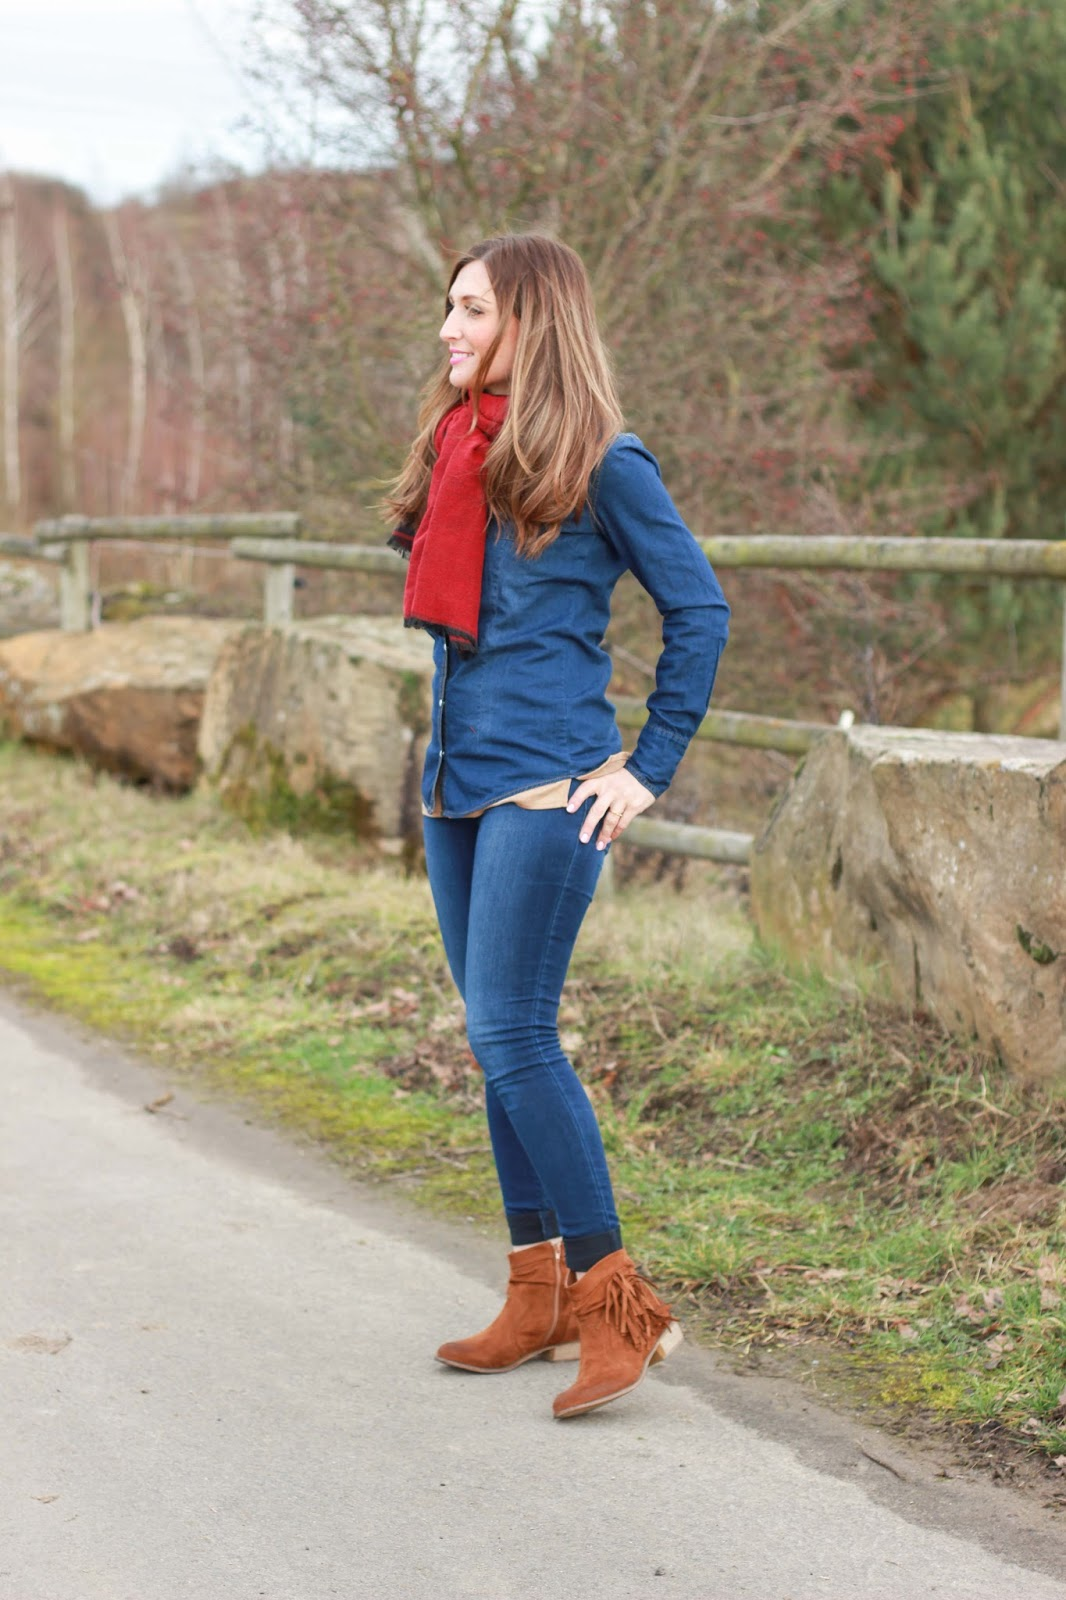 Fashionstylebyjohanna - My Colloseum - Bachelor - My Colloseum Outfits - Fashionblogger aus Deutschland . Deutsche Fahshionblogger - Modeblogger aus Deutschland - Outfitinspiration - Streetstyle - Deutschlands beste Modeblogger